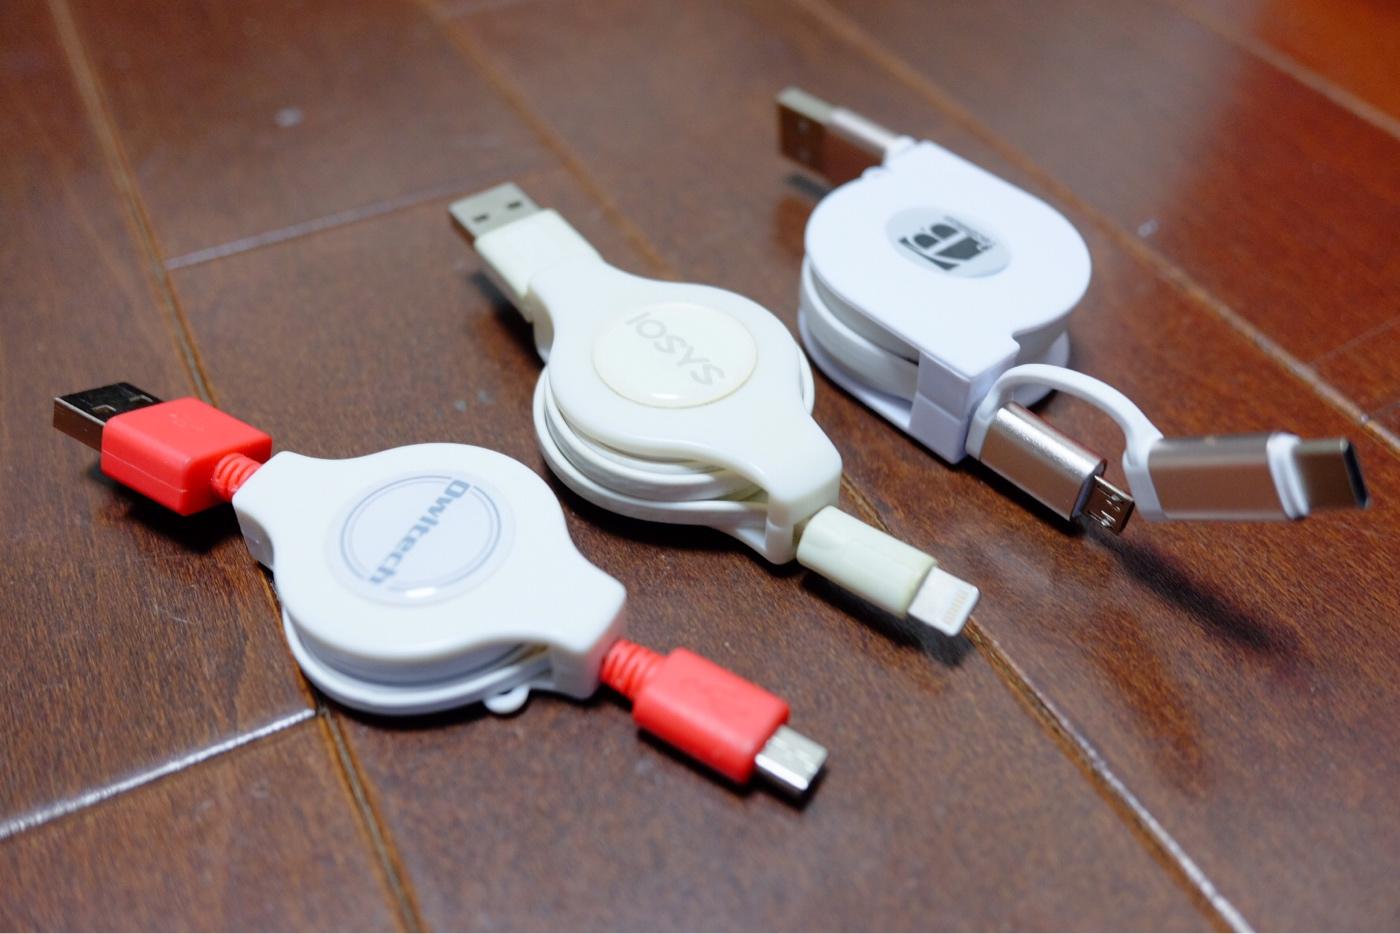 USB-C、MicroUSB、Lightningのそれぞれのケーブル